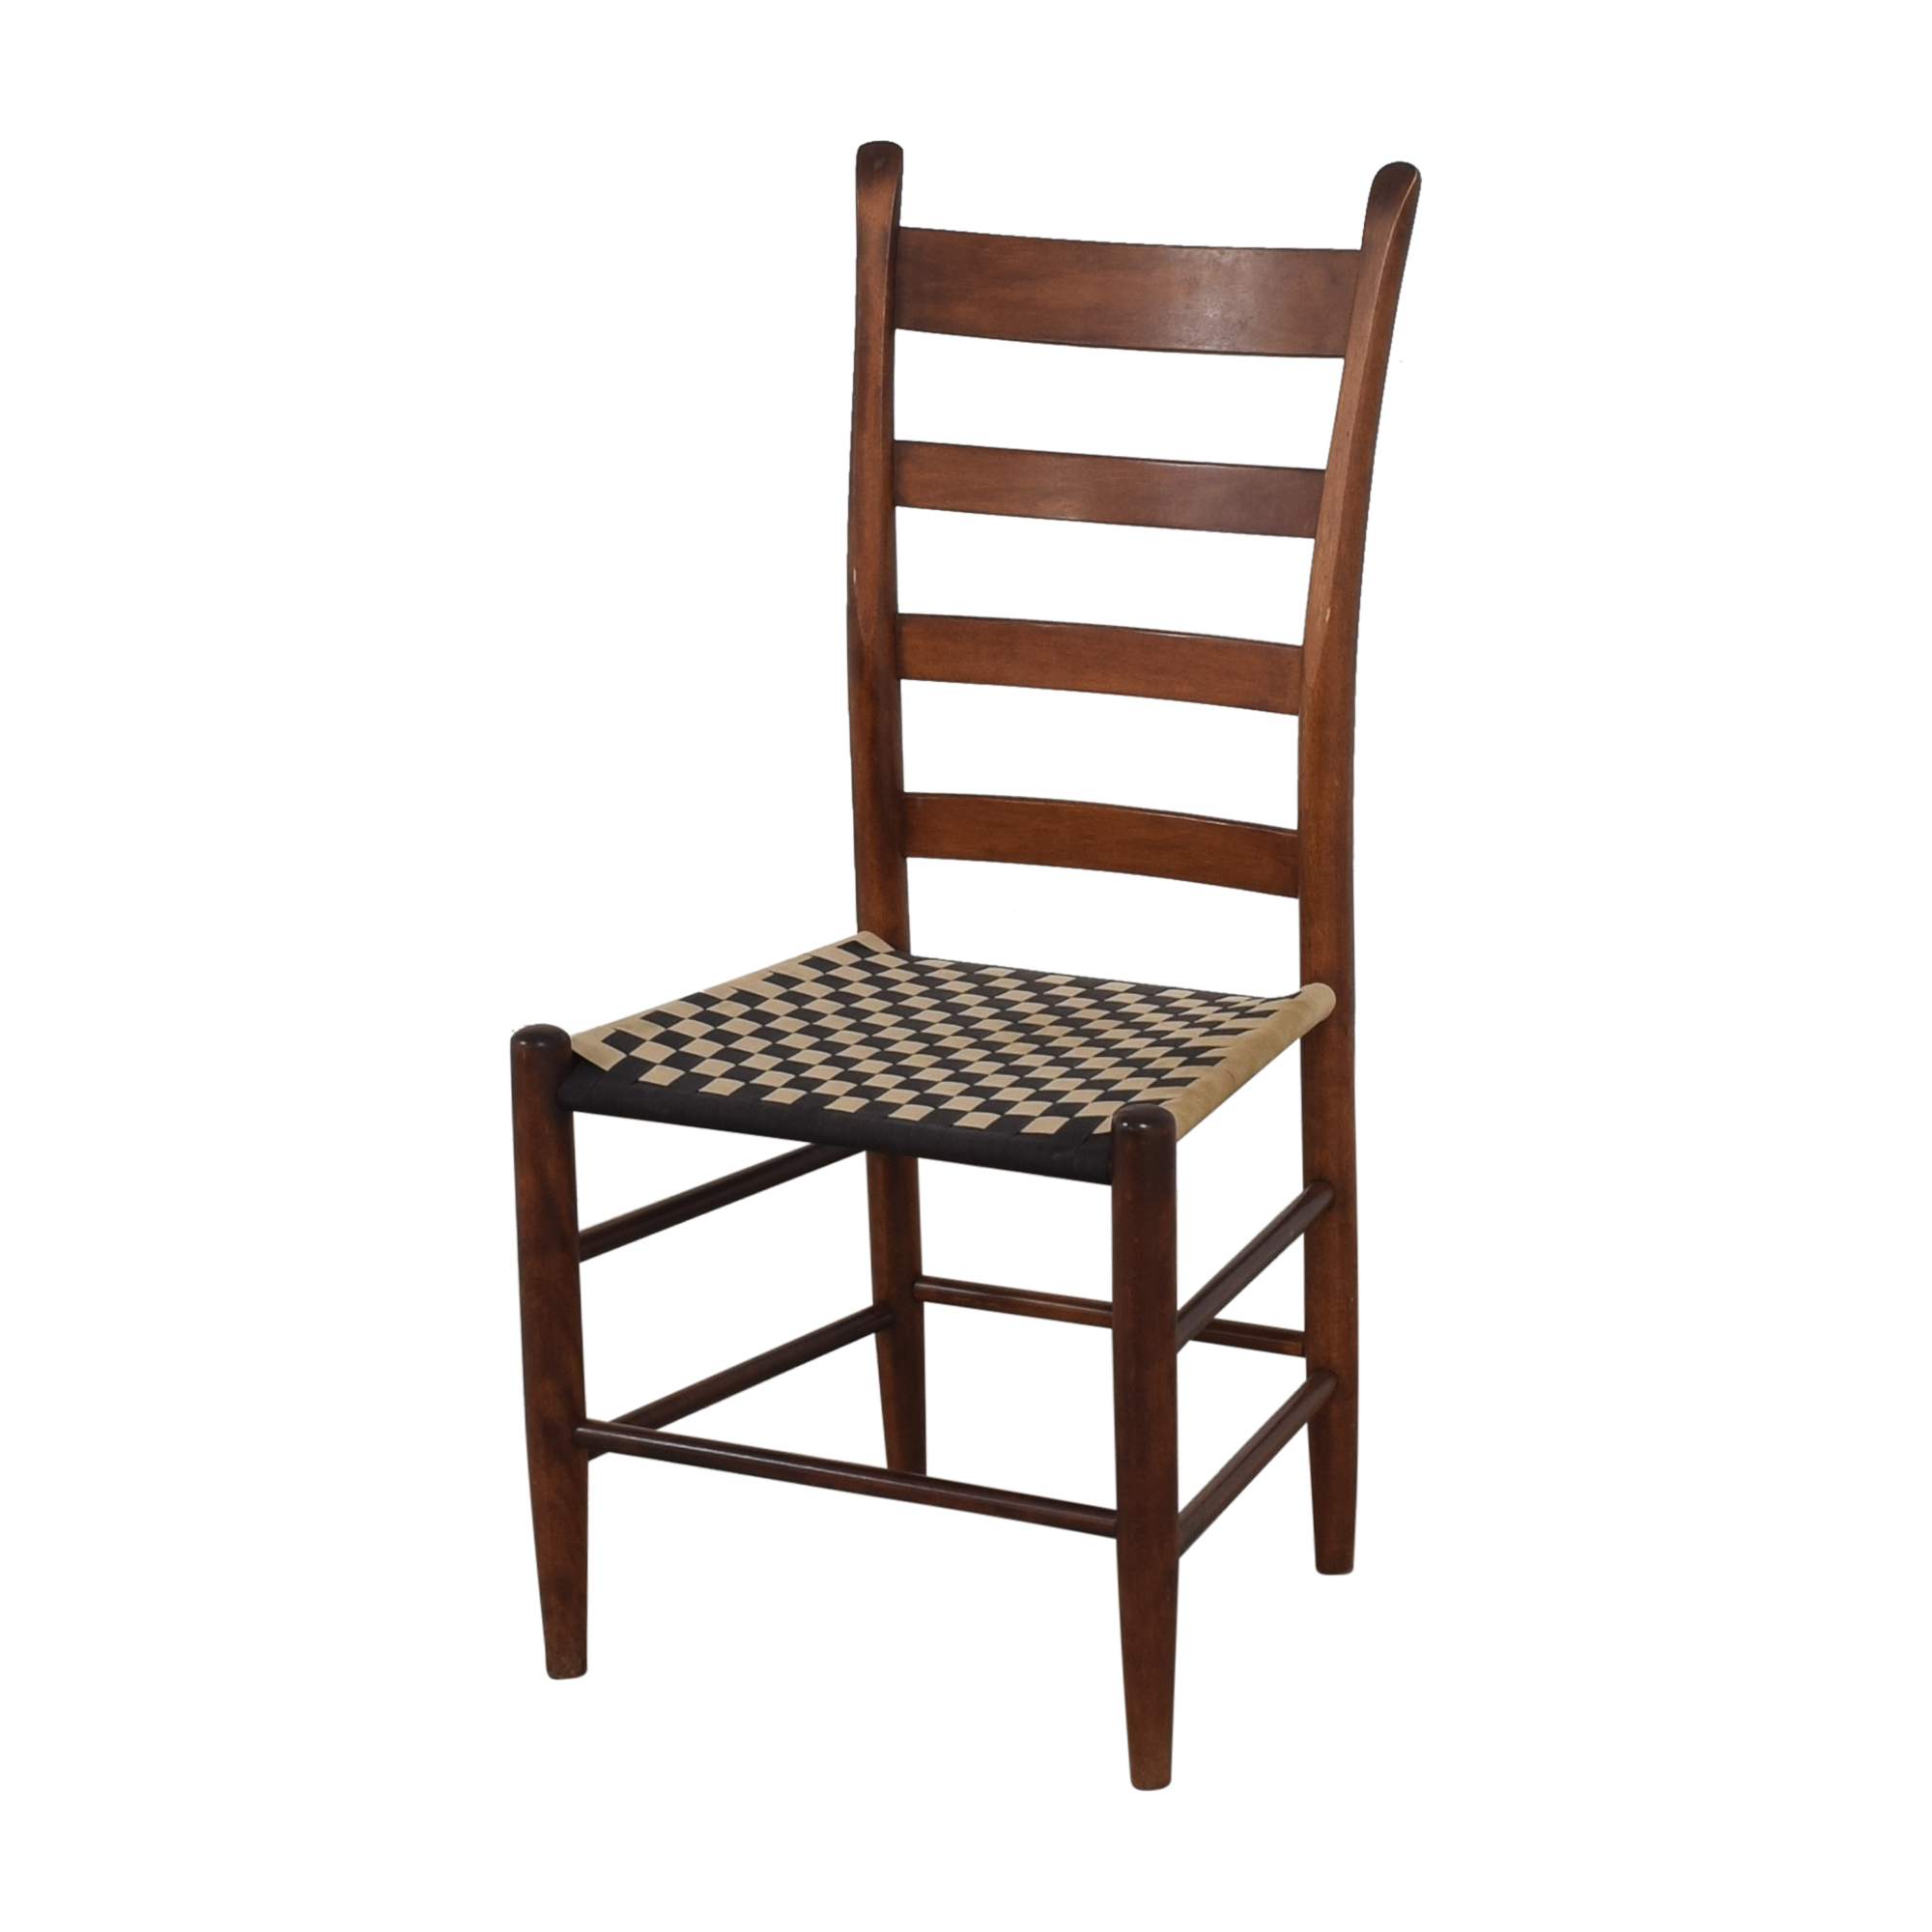 shop Nichols & Stone Ladder Back Dining Chairs Nichols & Stone Dining Chairs